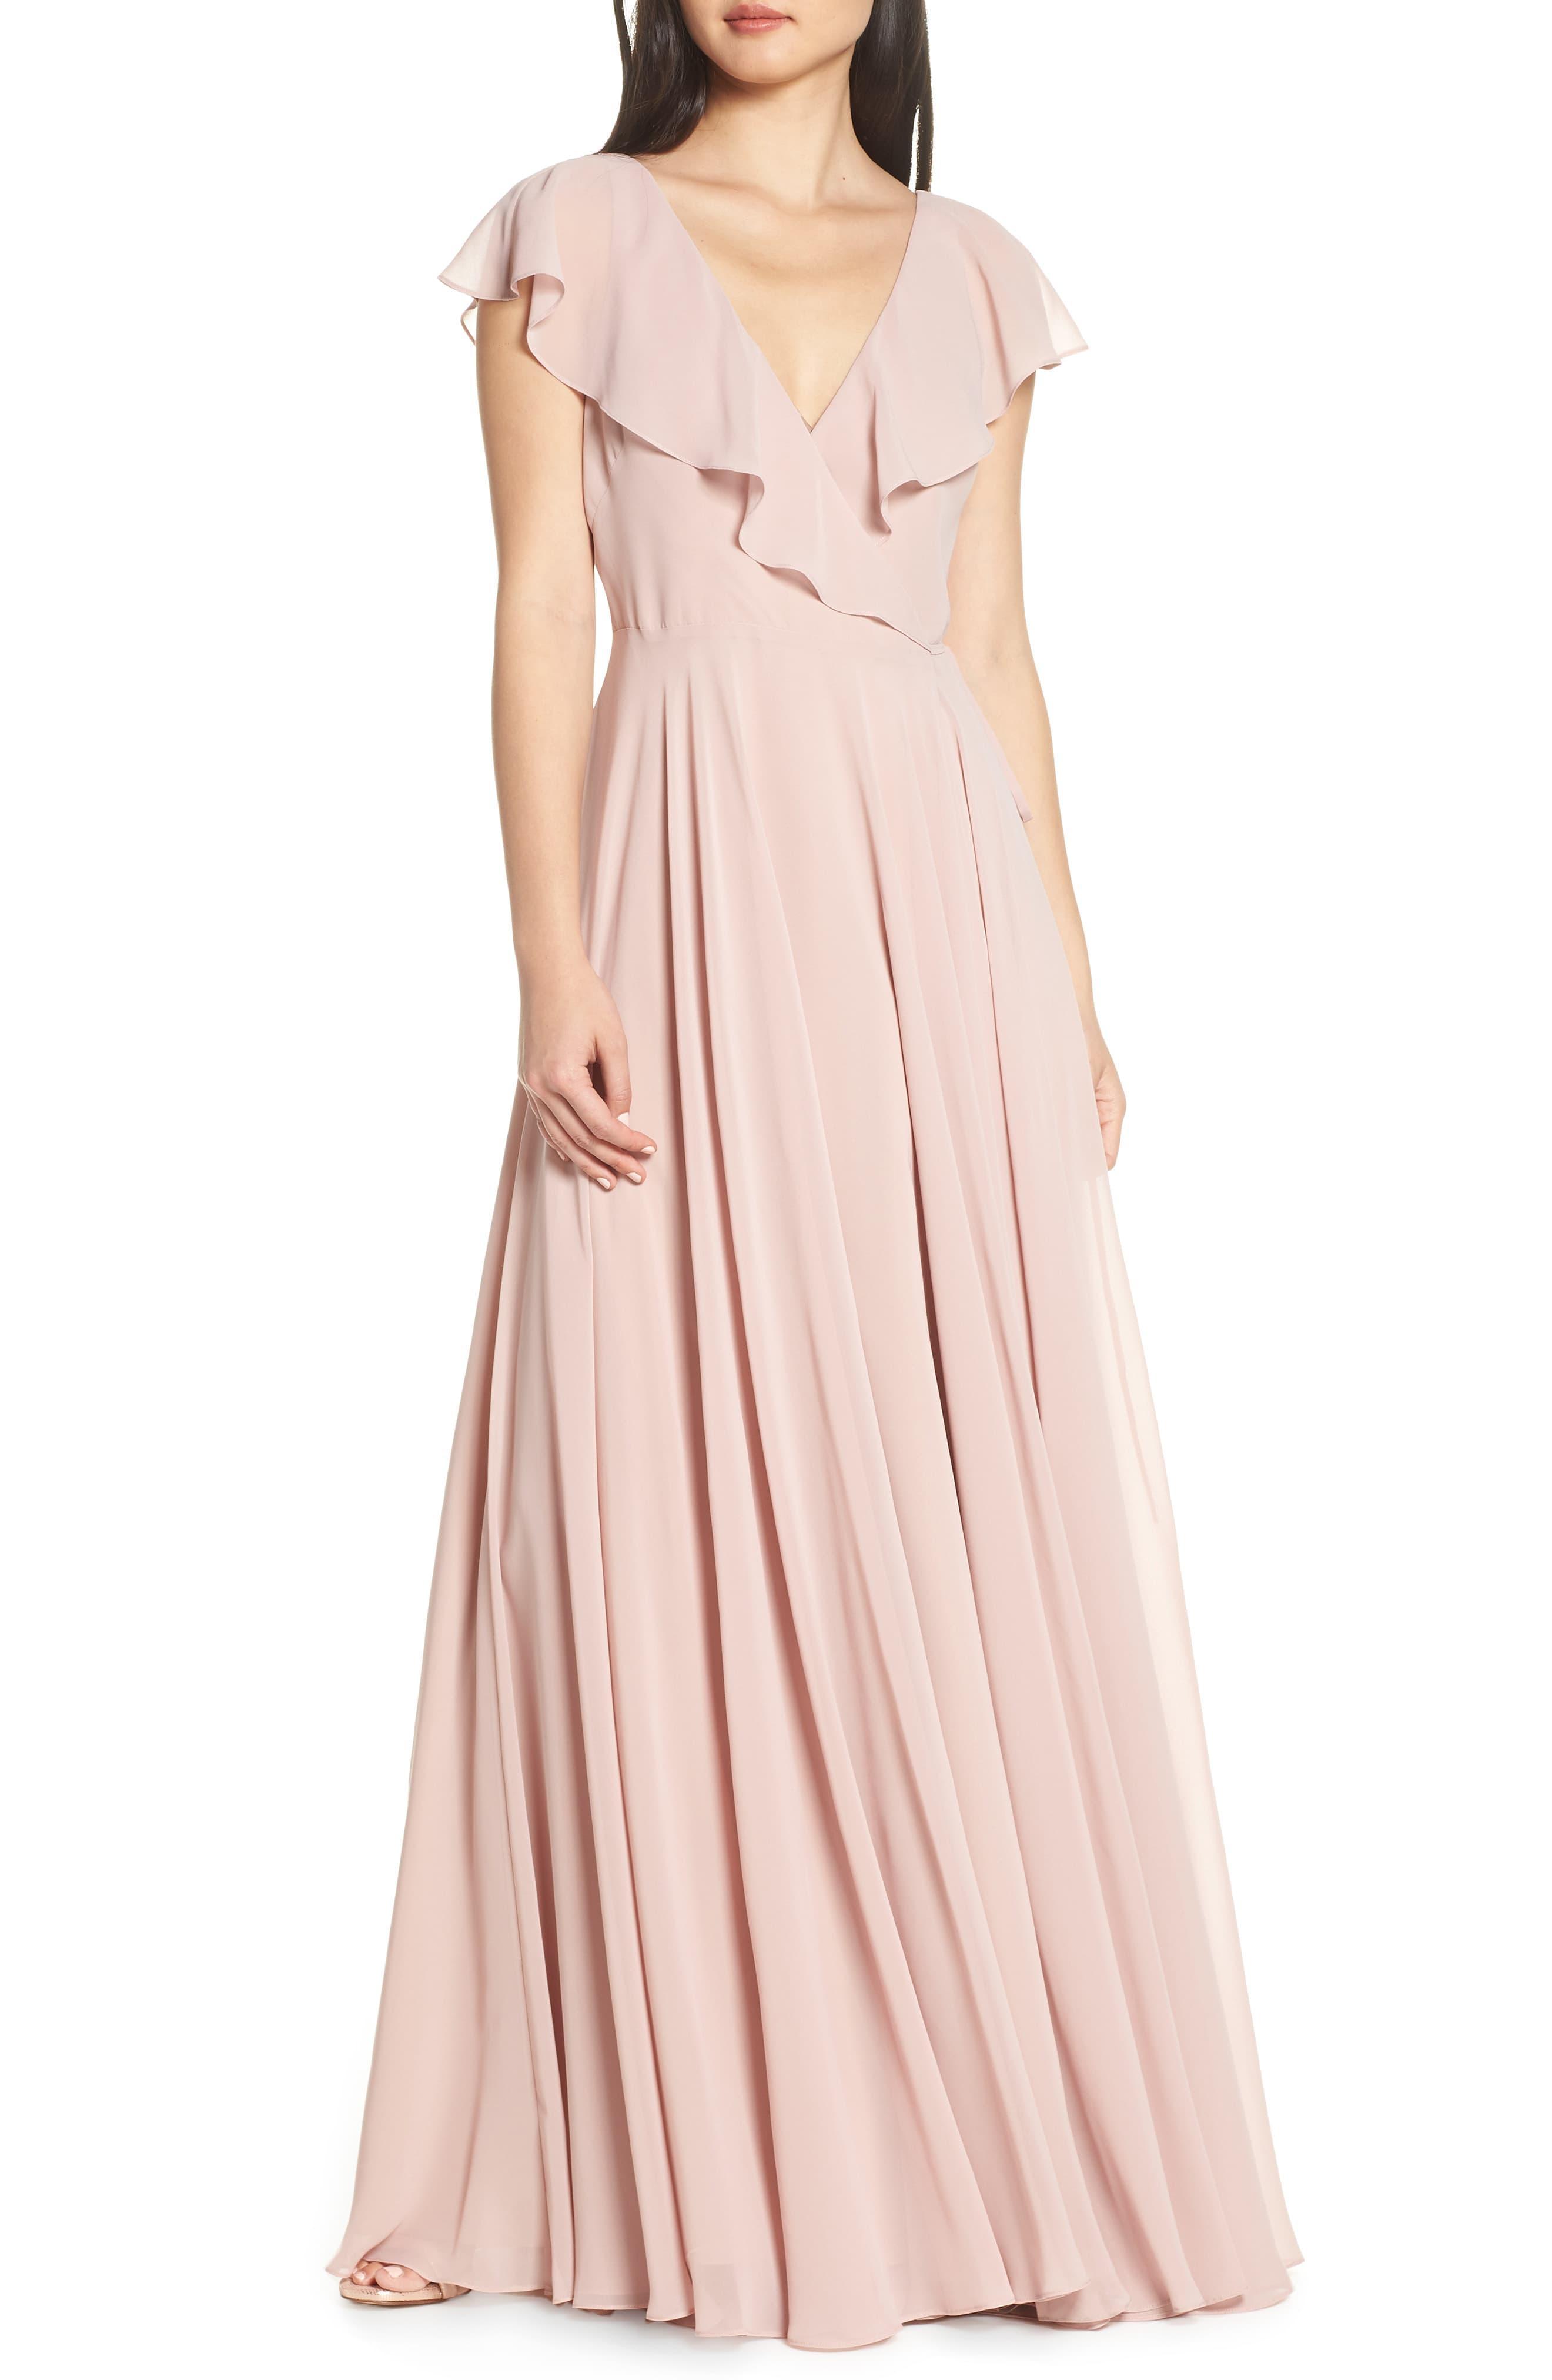 0097dc16a8a4d Jenny Yoo Faye Ruffle Wrap Chiffon Evening Dress in Pink - Lyst